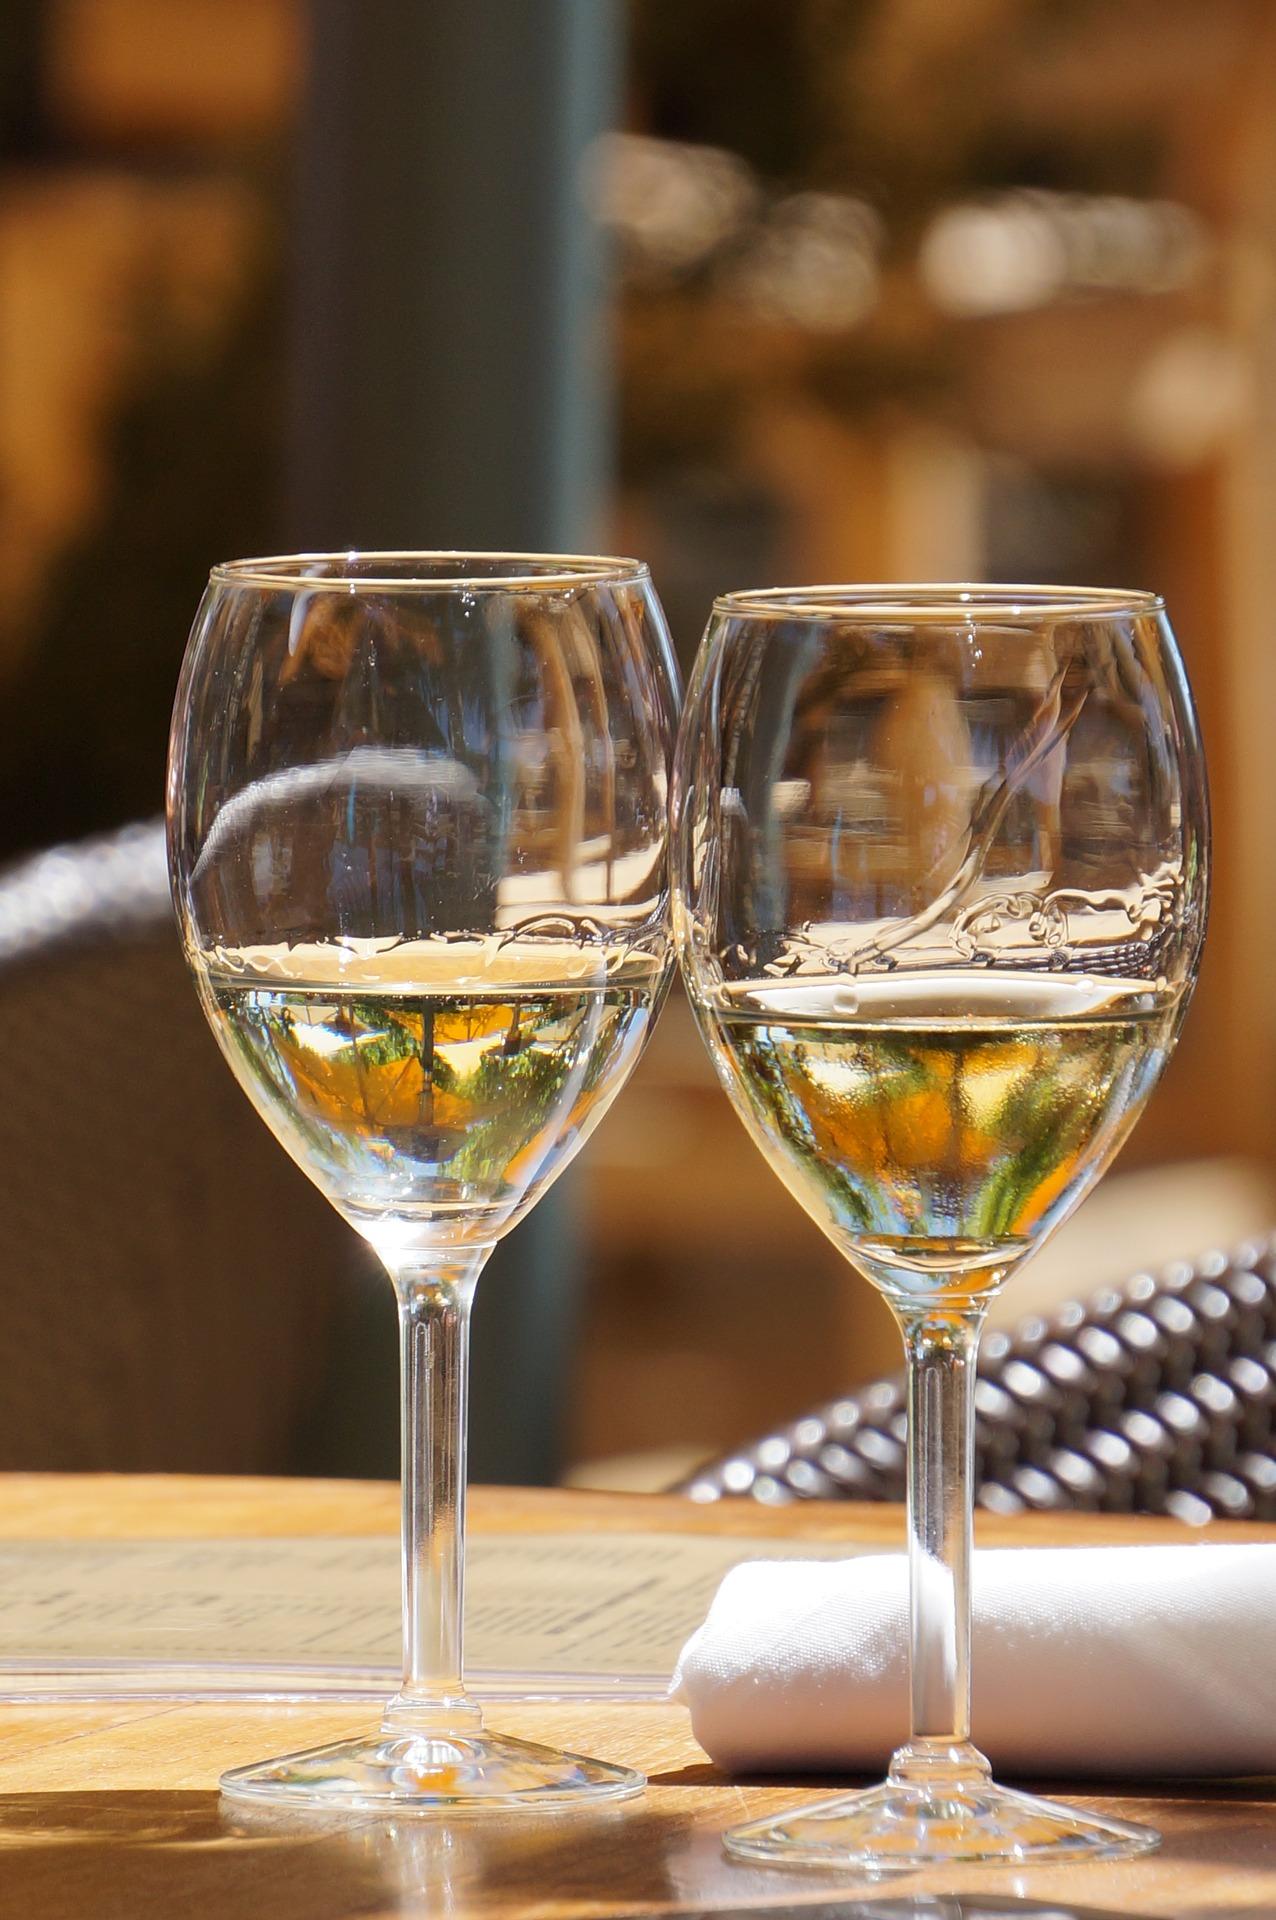 wine-glasses-1266944_1920.jpg